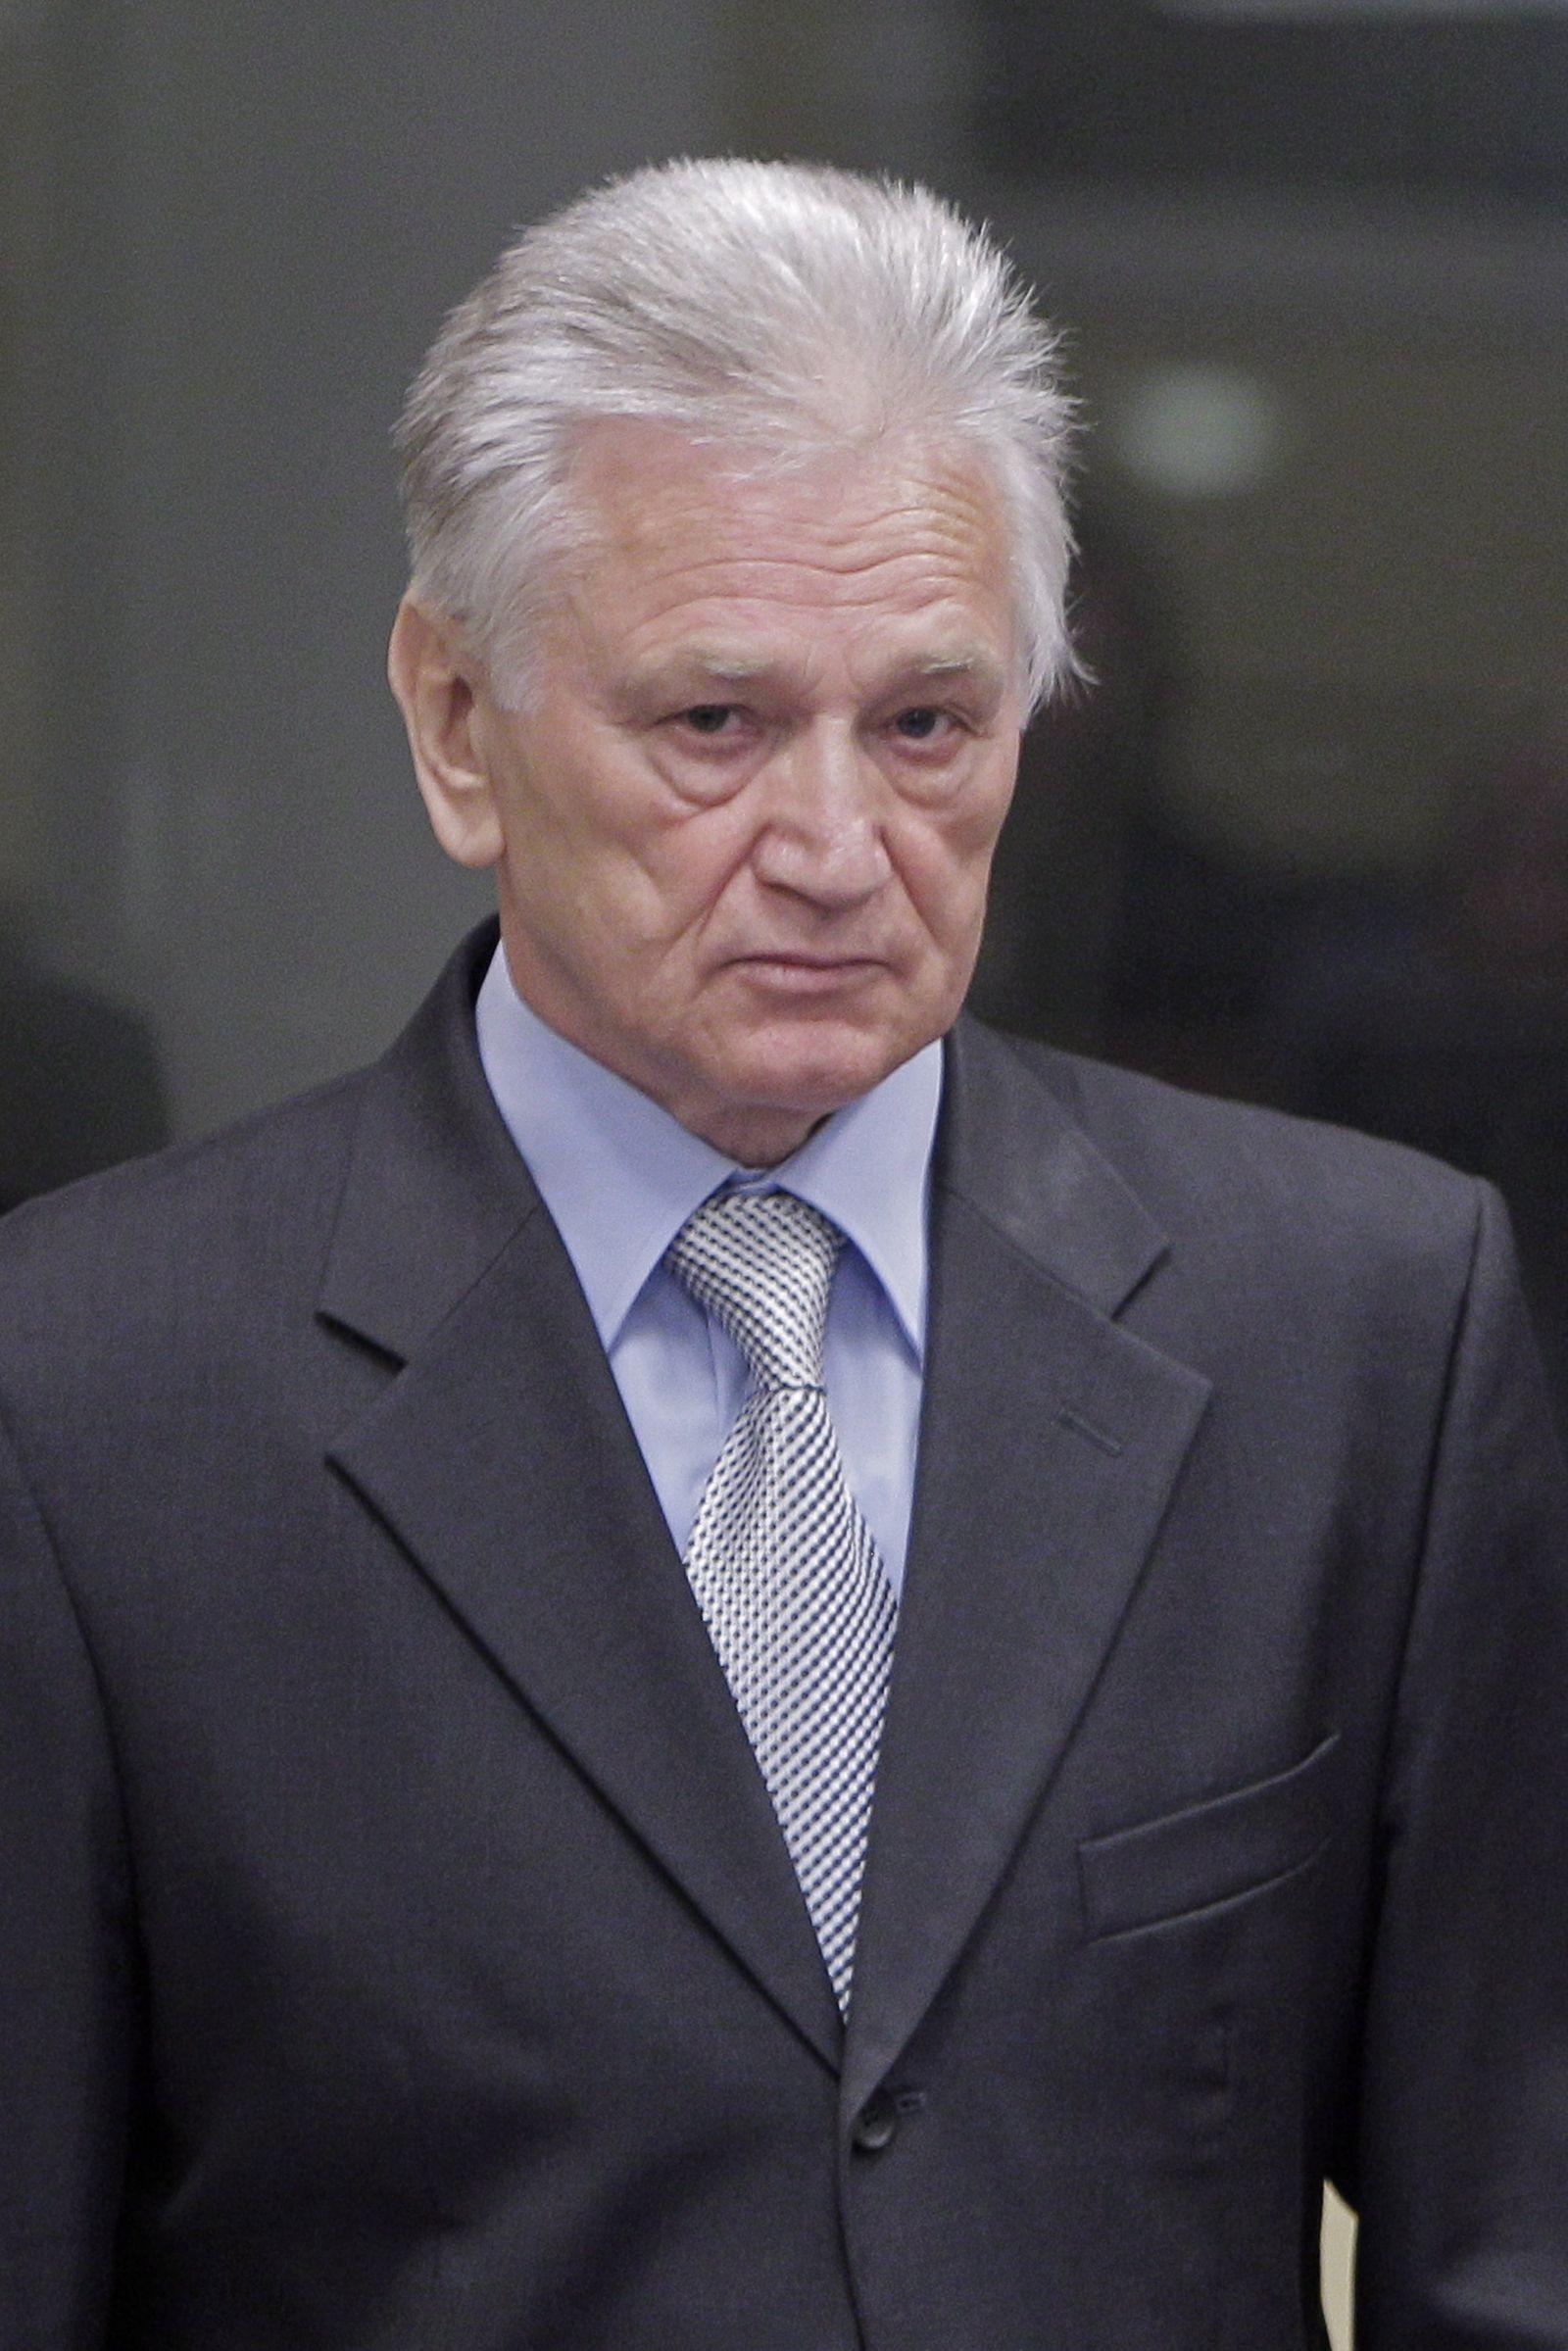 Milosevic's general guilty of war crimes